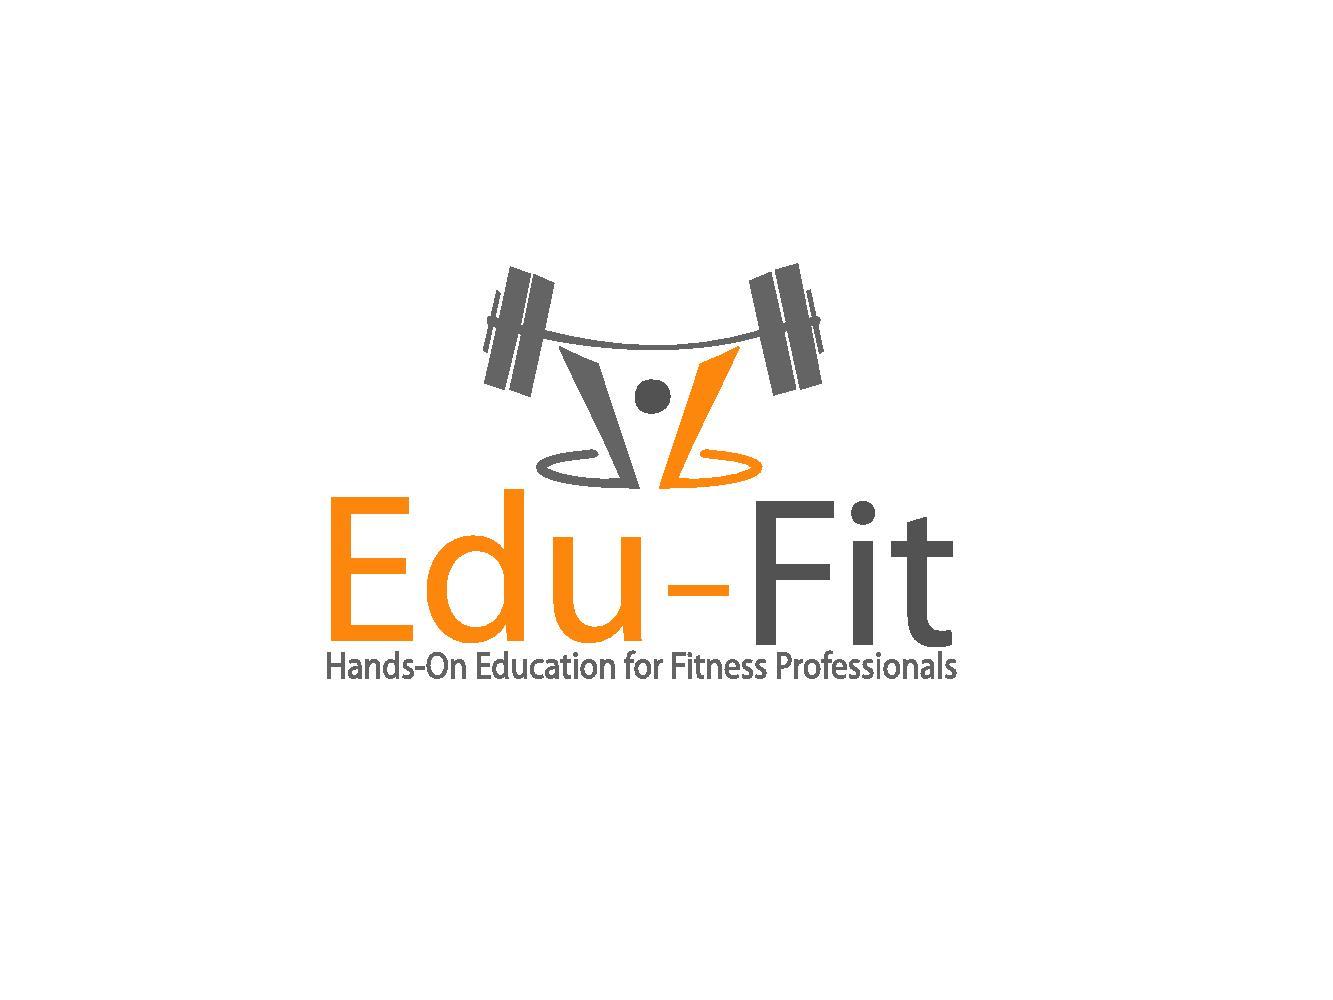 Miami Florida Personal Training Certification Corrective Exercise Nasm